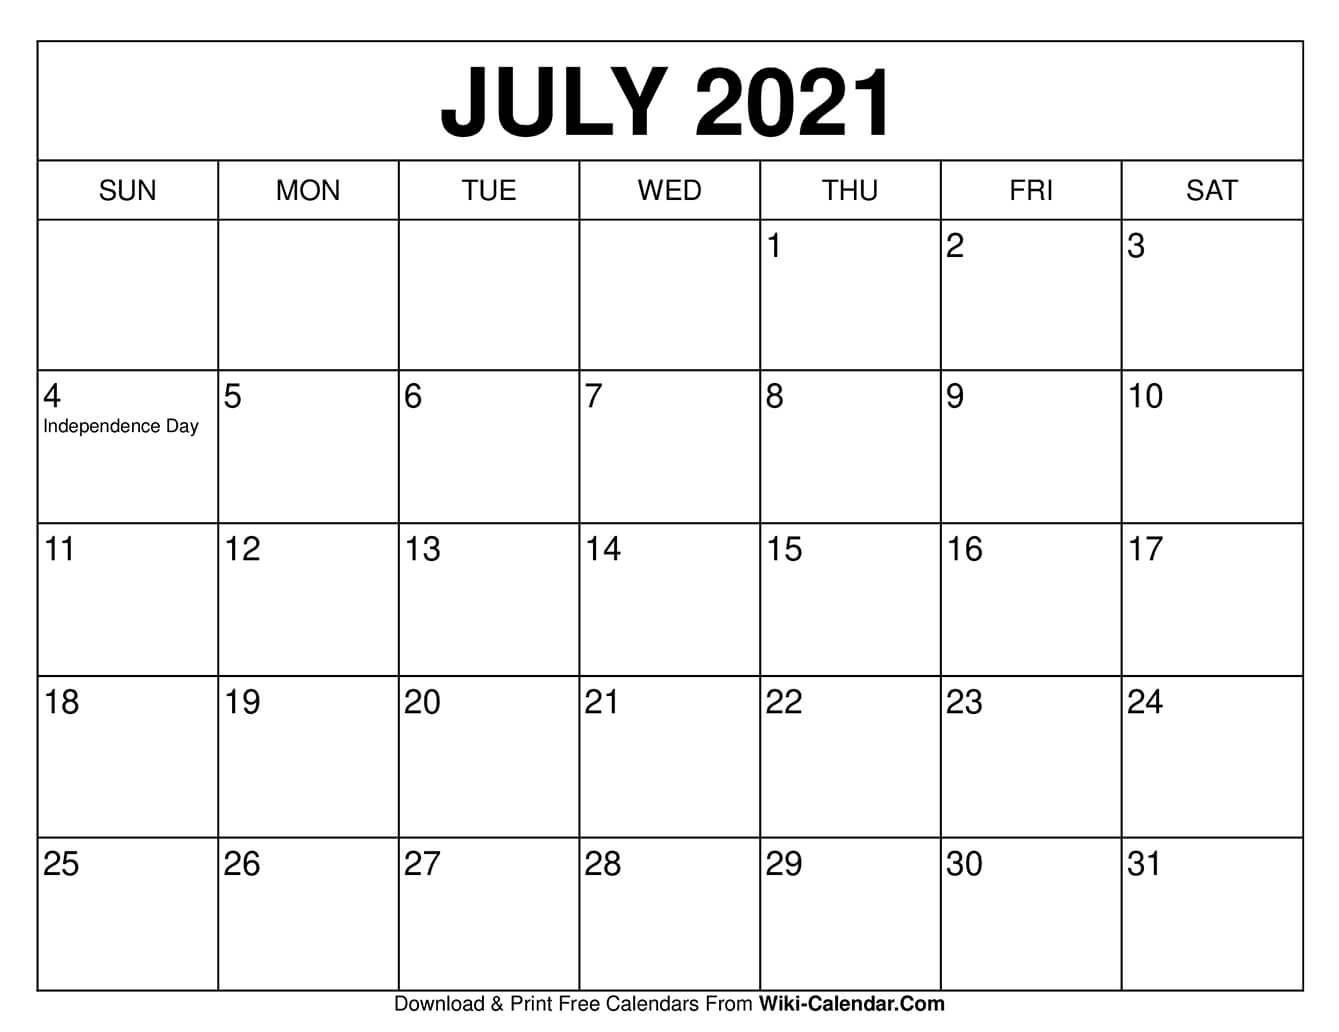 July 2021 Calendar In 2020 | Free Calendars To Print Free